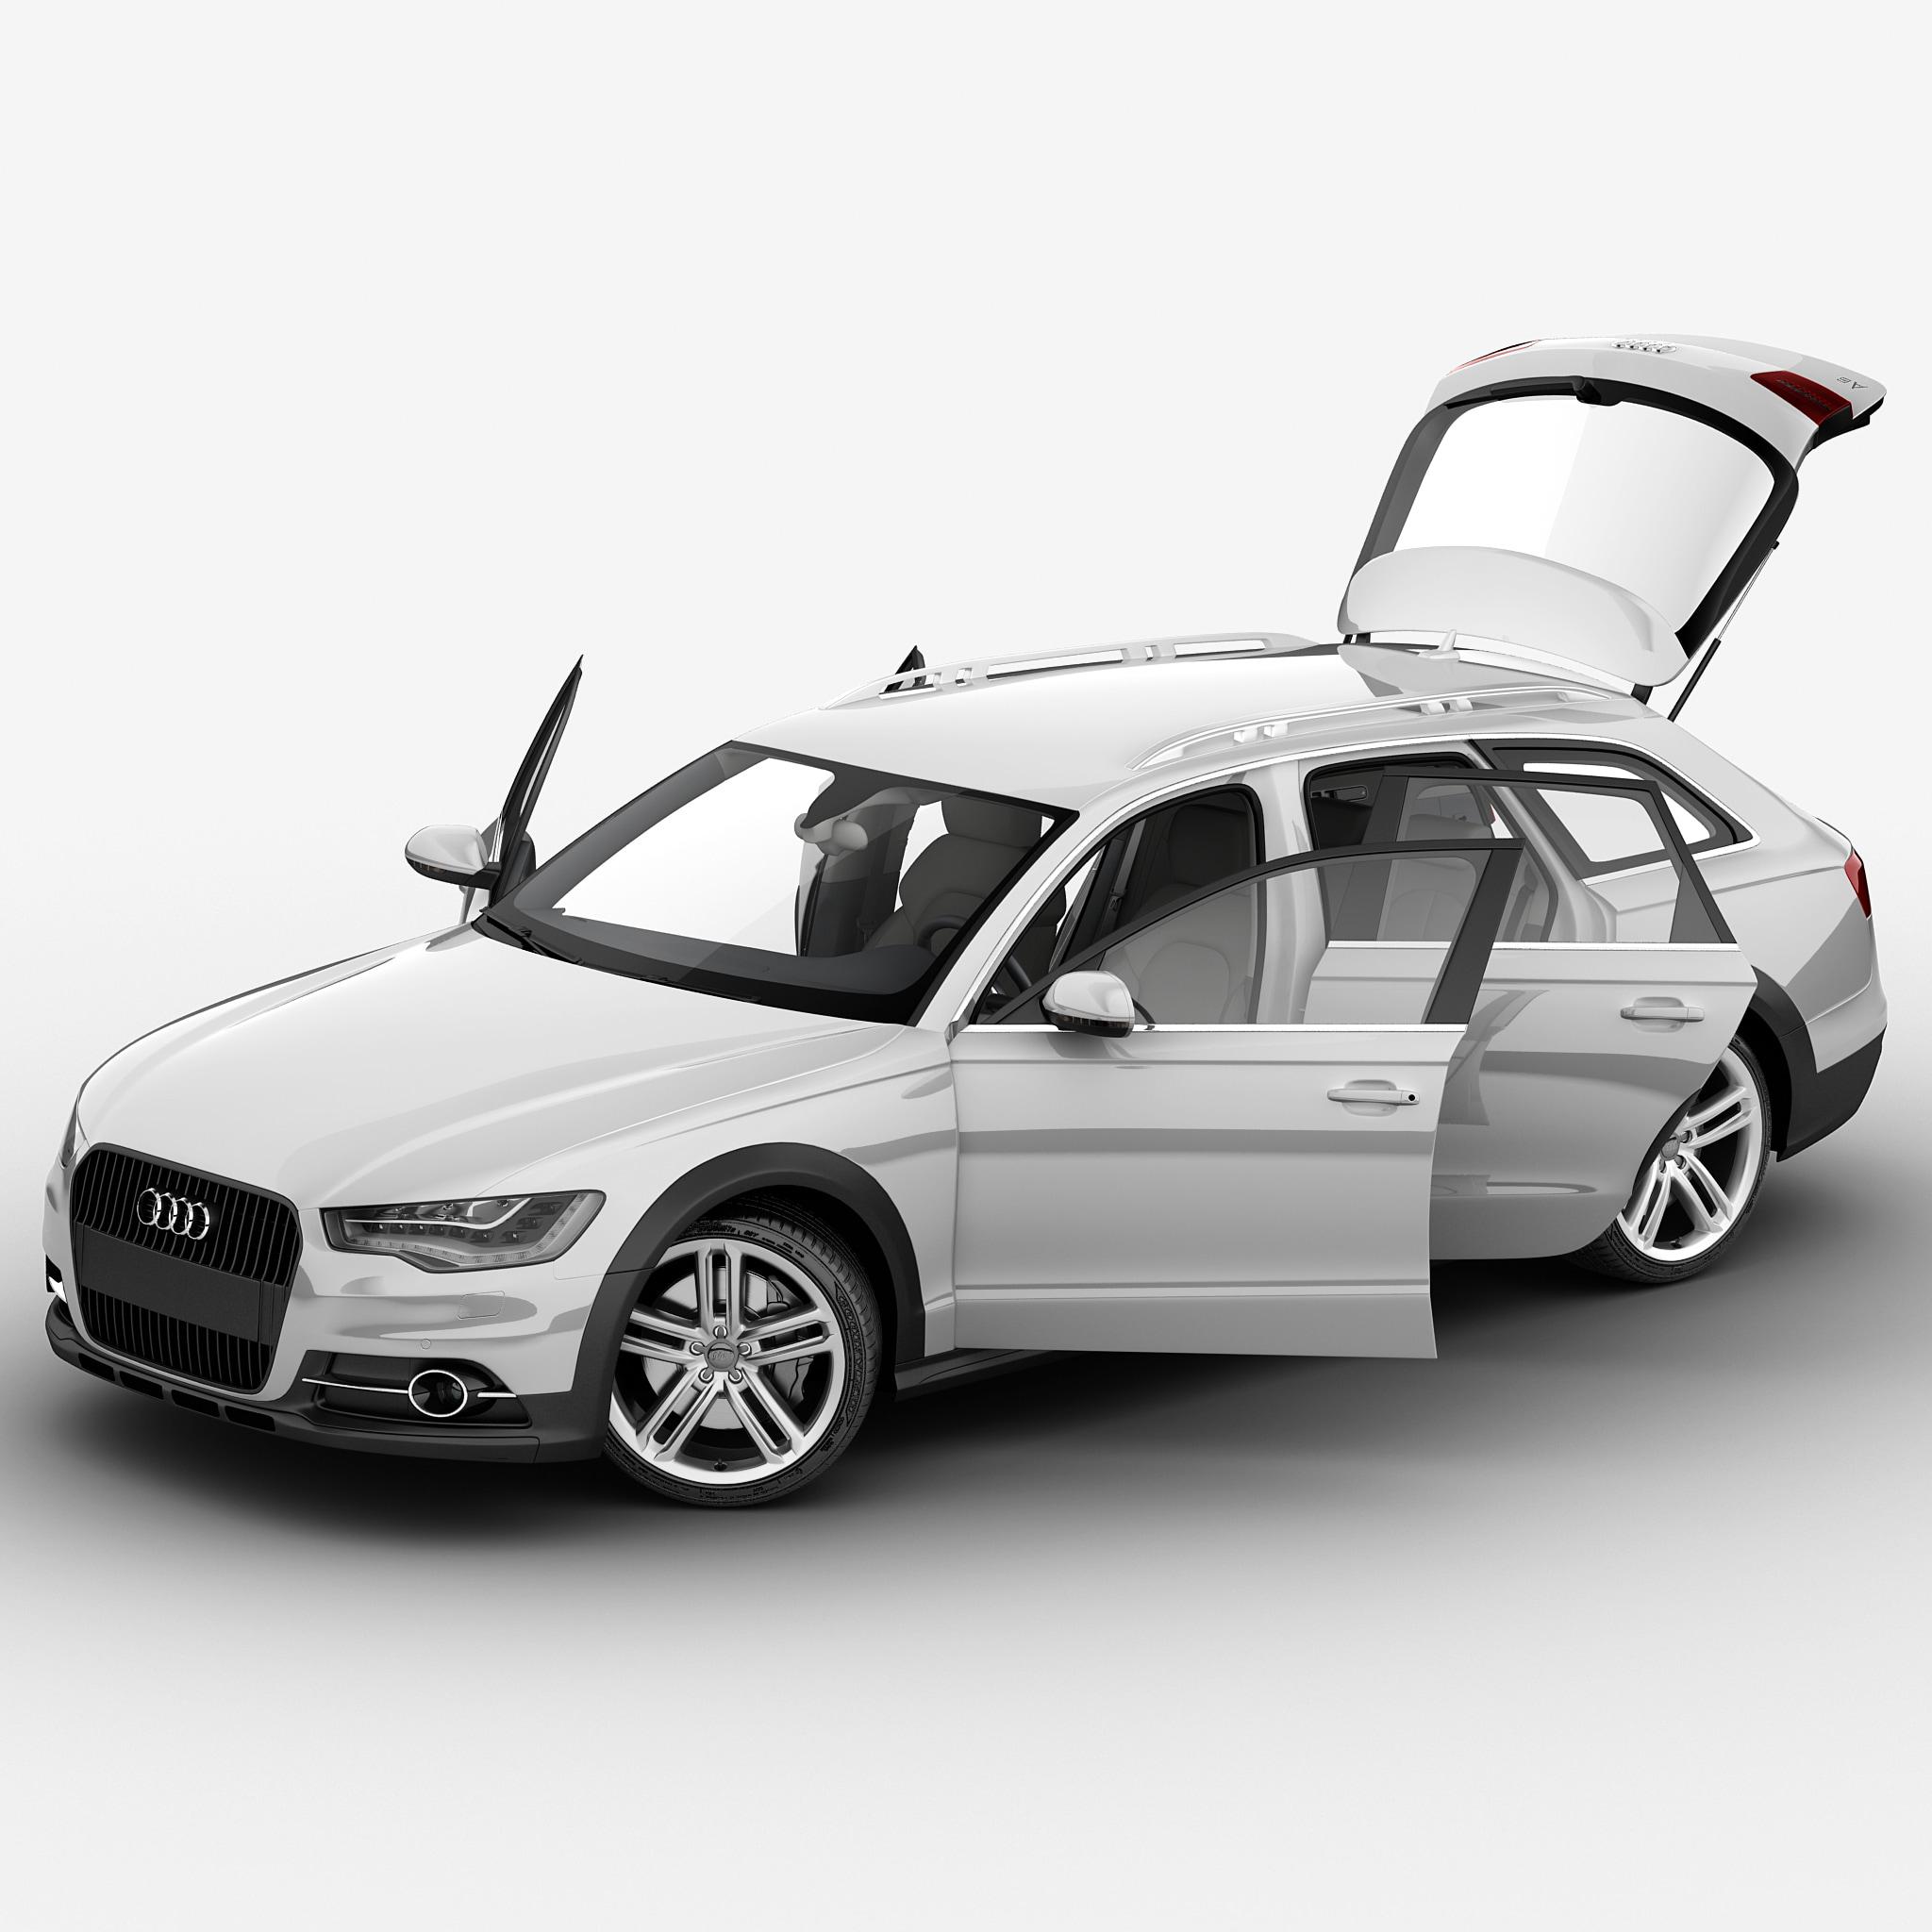 Audi A6 2013 Rigged_2.jpg